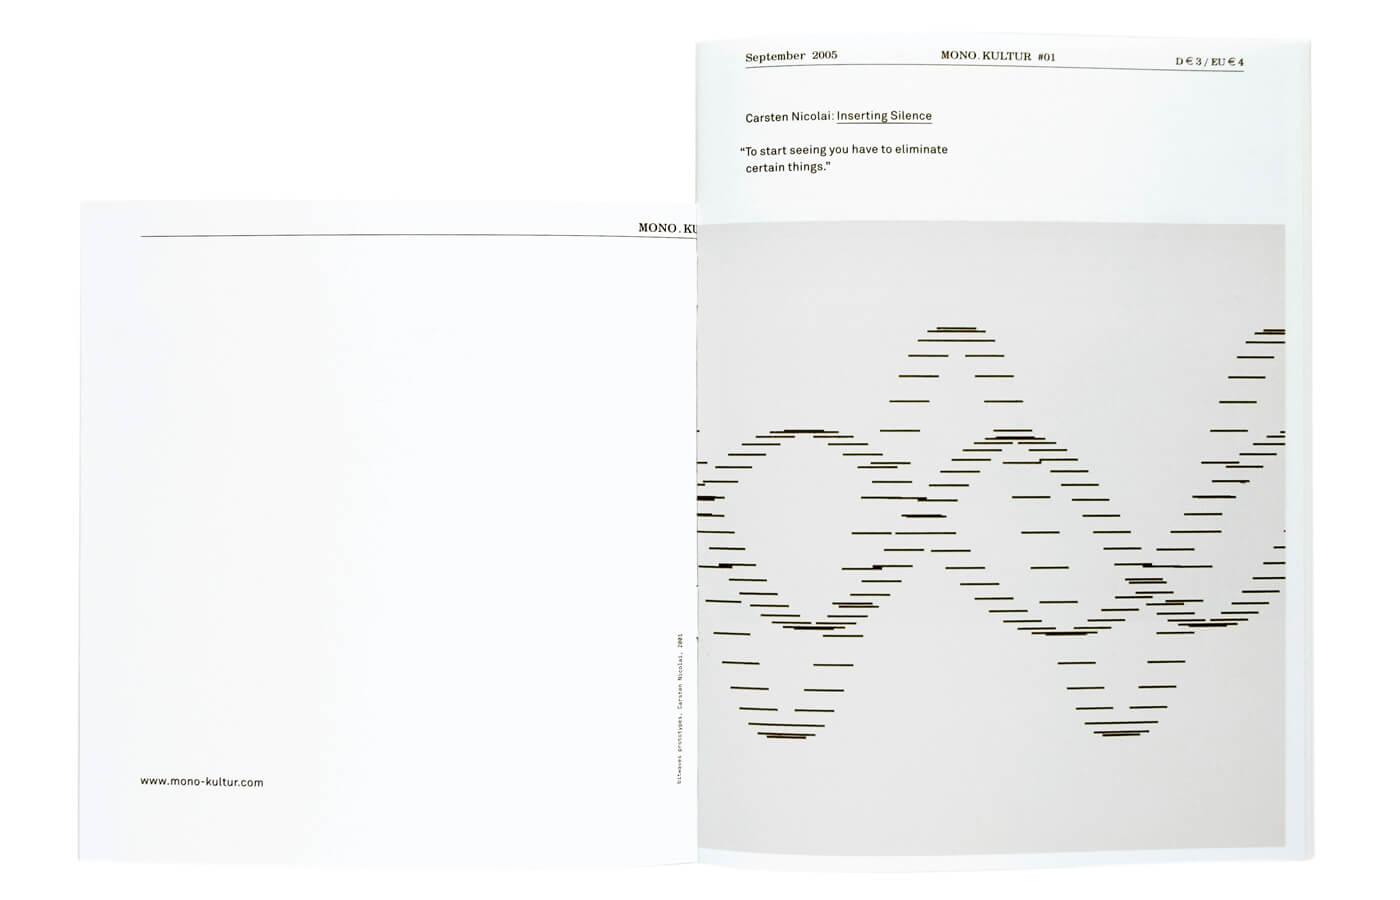 mono.kultur #01, Carsten Nicolai: Inserting Silence